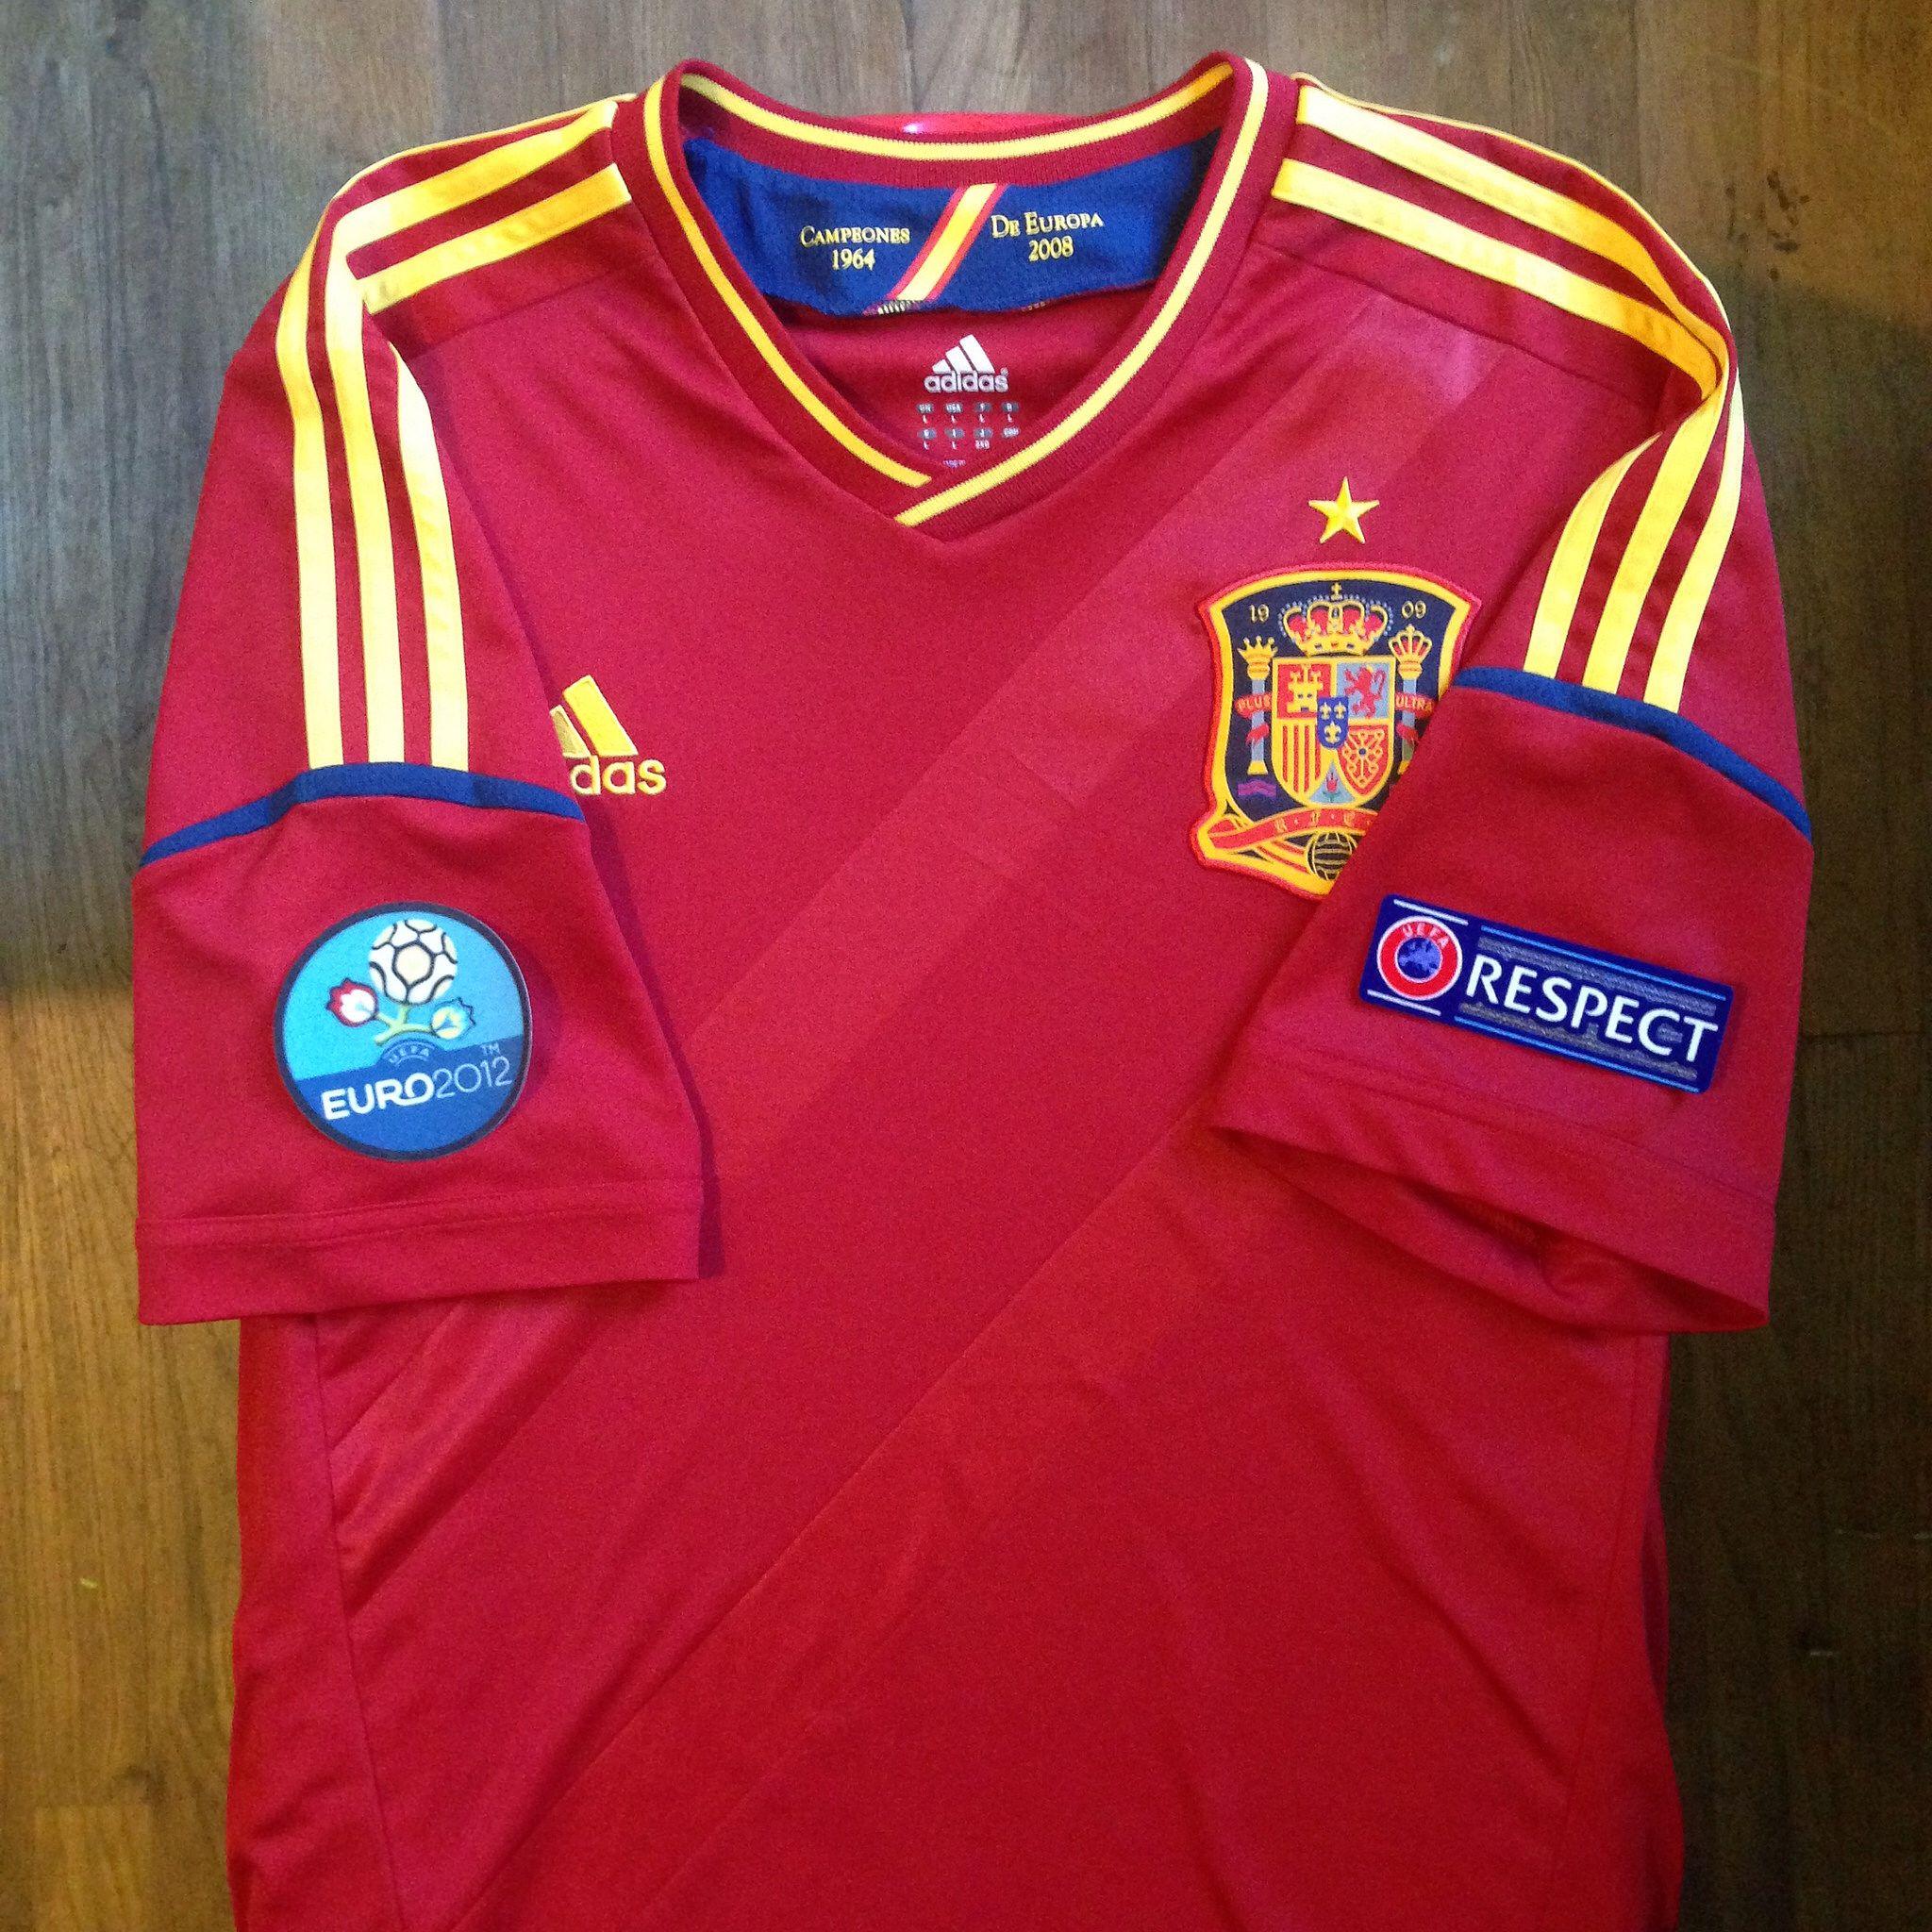 36bbebe4aeaa UEFA Euro 2012 Poland-Ukraine Spain Home Jersey    Primera Equipación de la  Selección